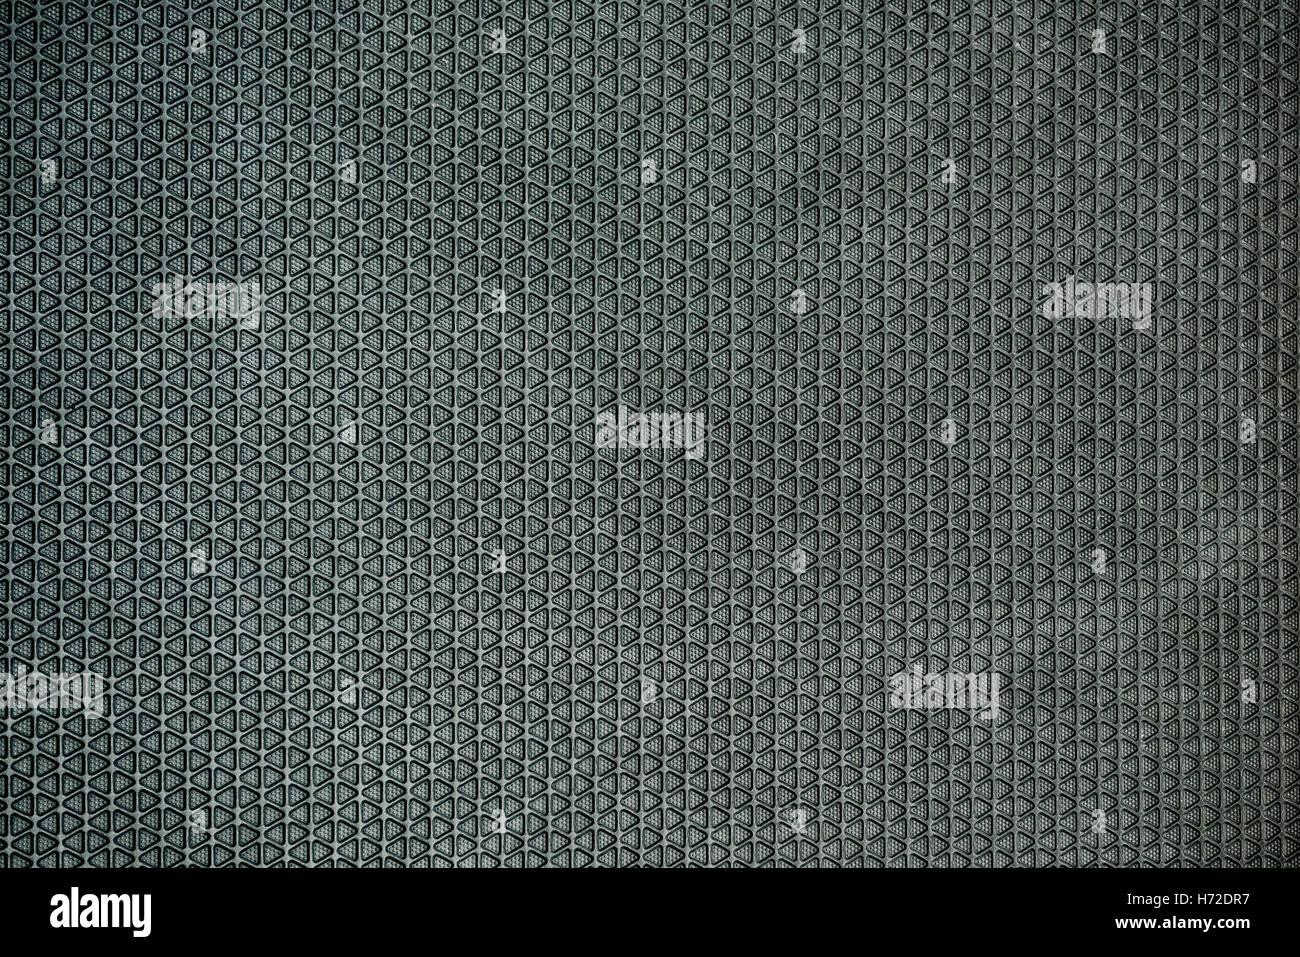 Los pavimentos de goma Antecedentes Concepto Material Imagen De Stock